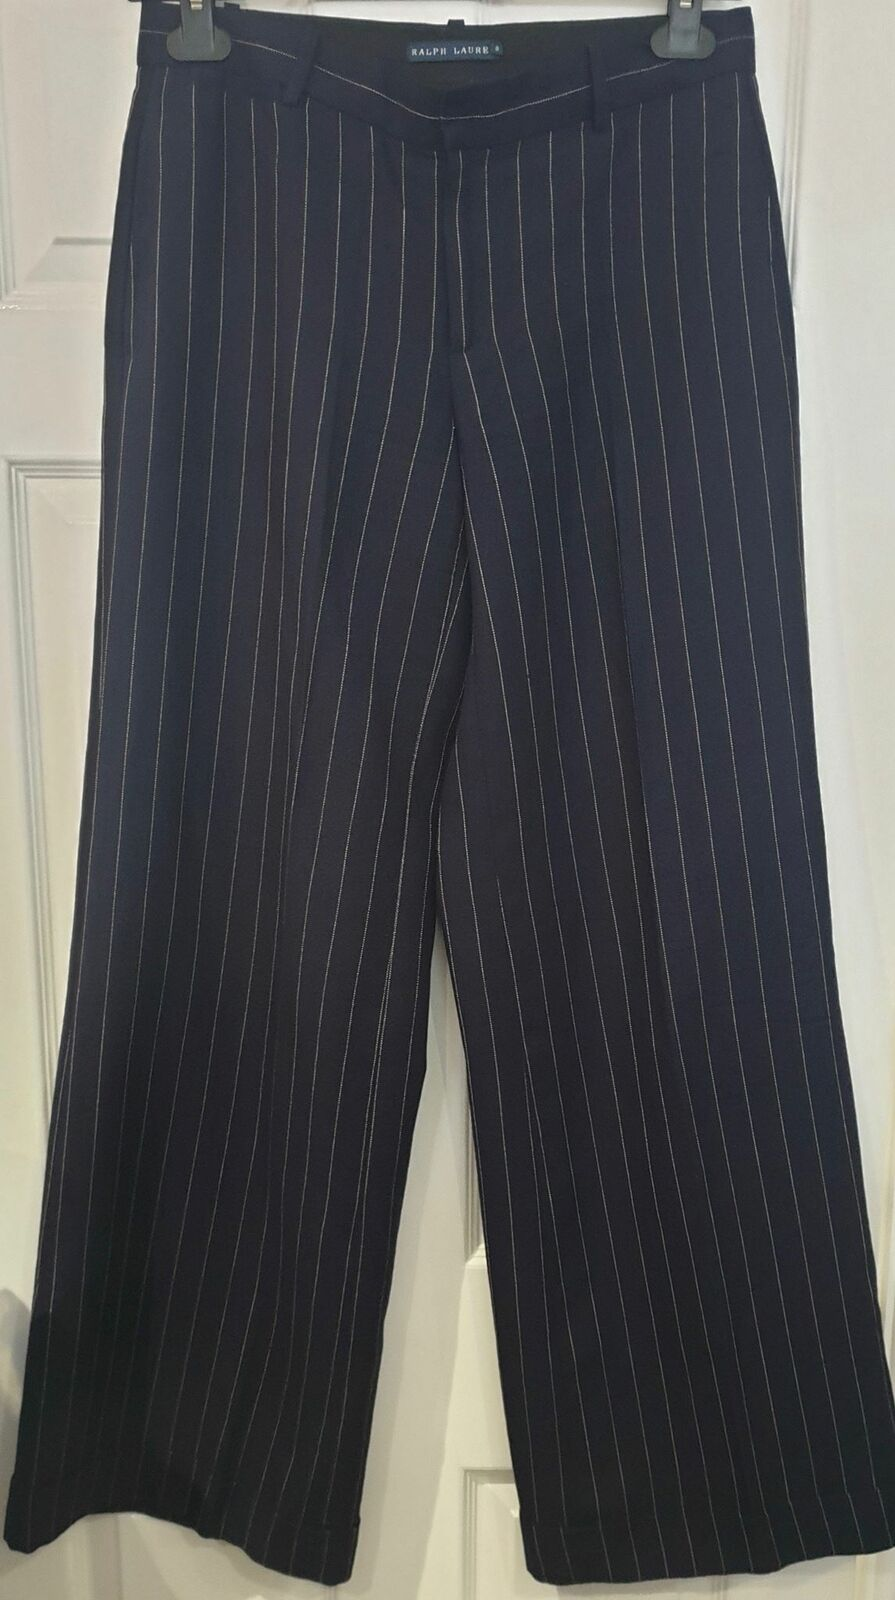 RALPH LAUREN Blau Label Navy Blau & Weiß Pinstripe Wide Leg Trousers Pants UK12